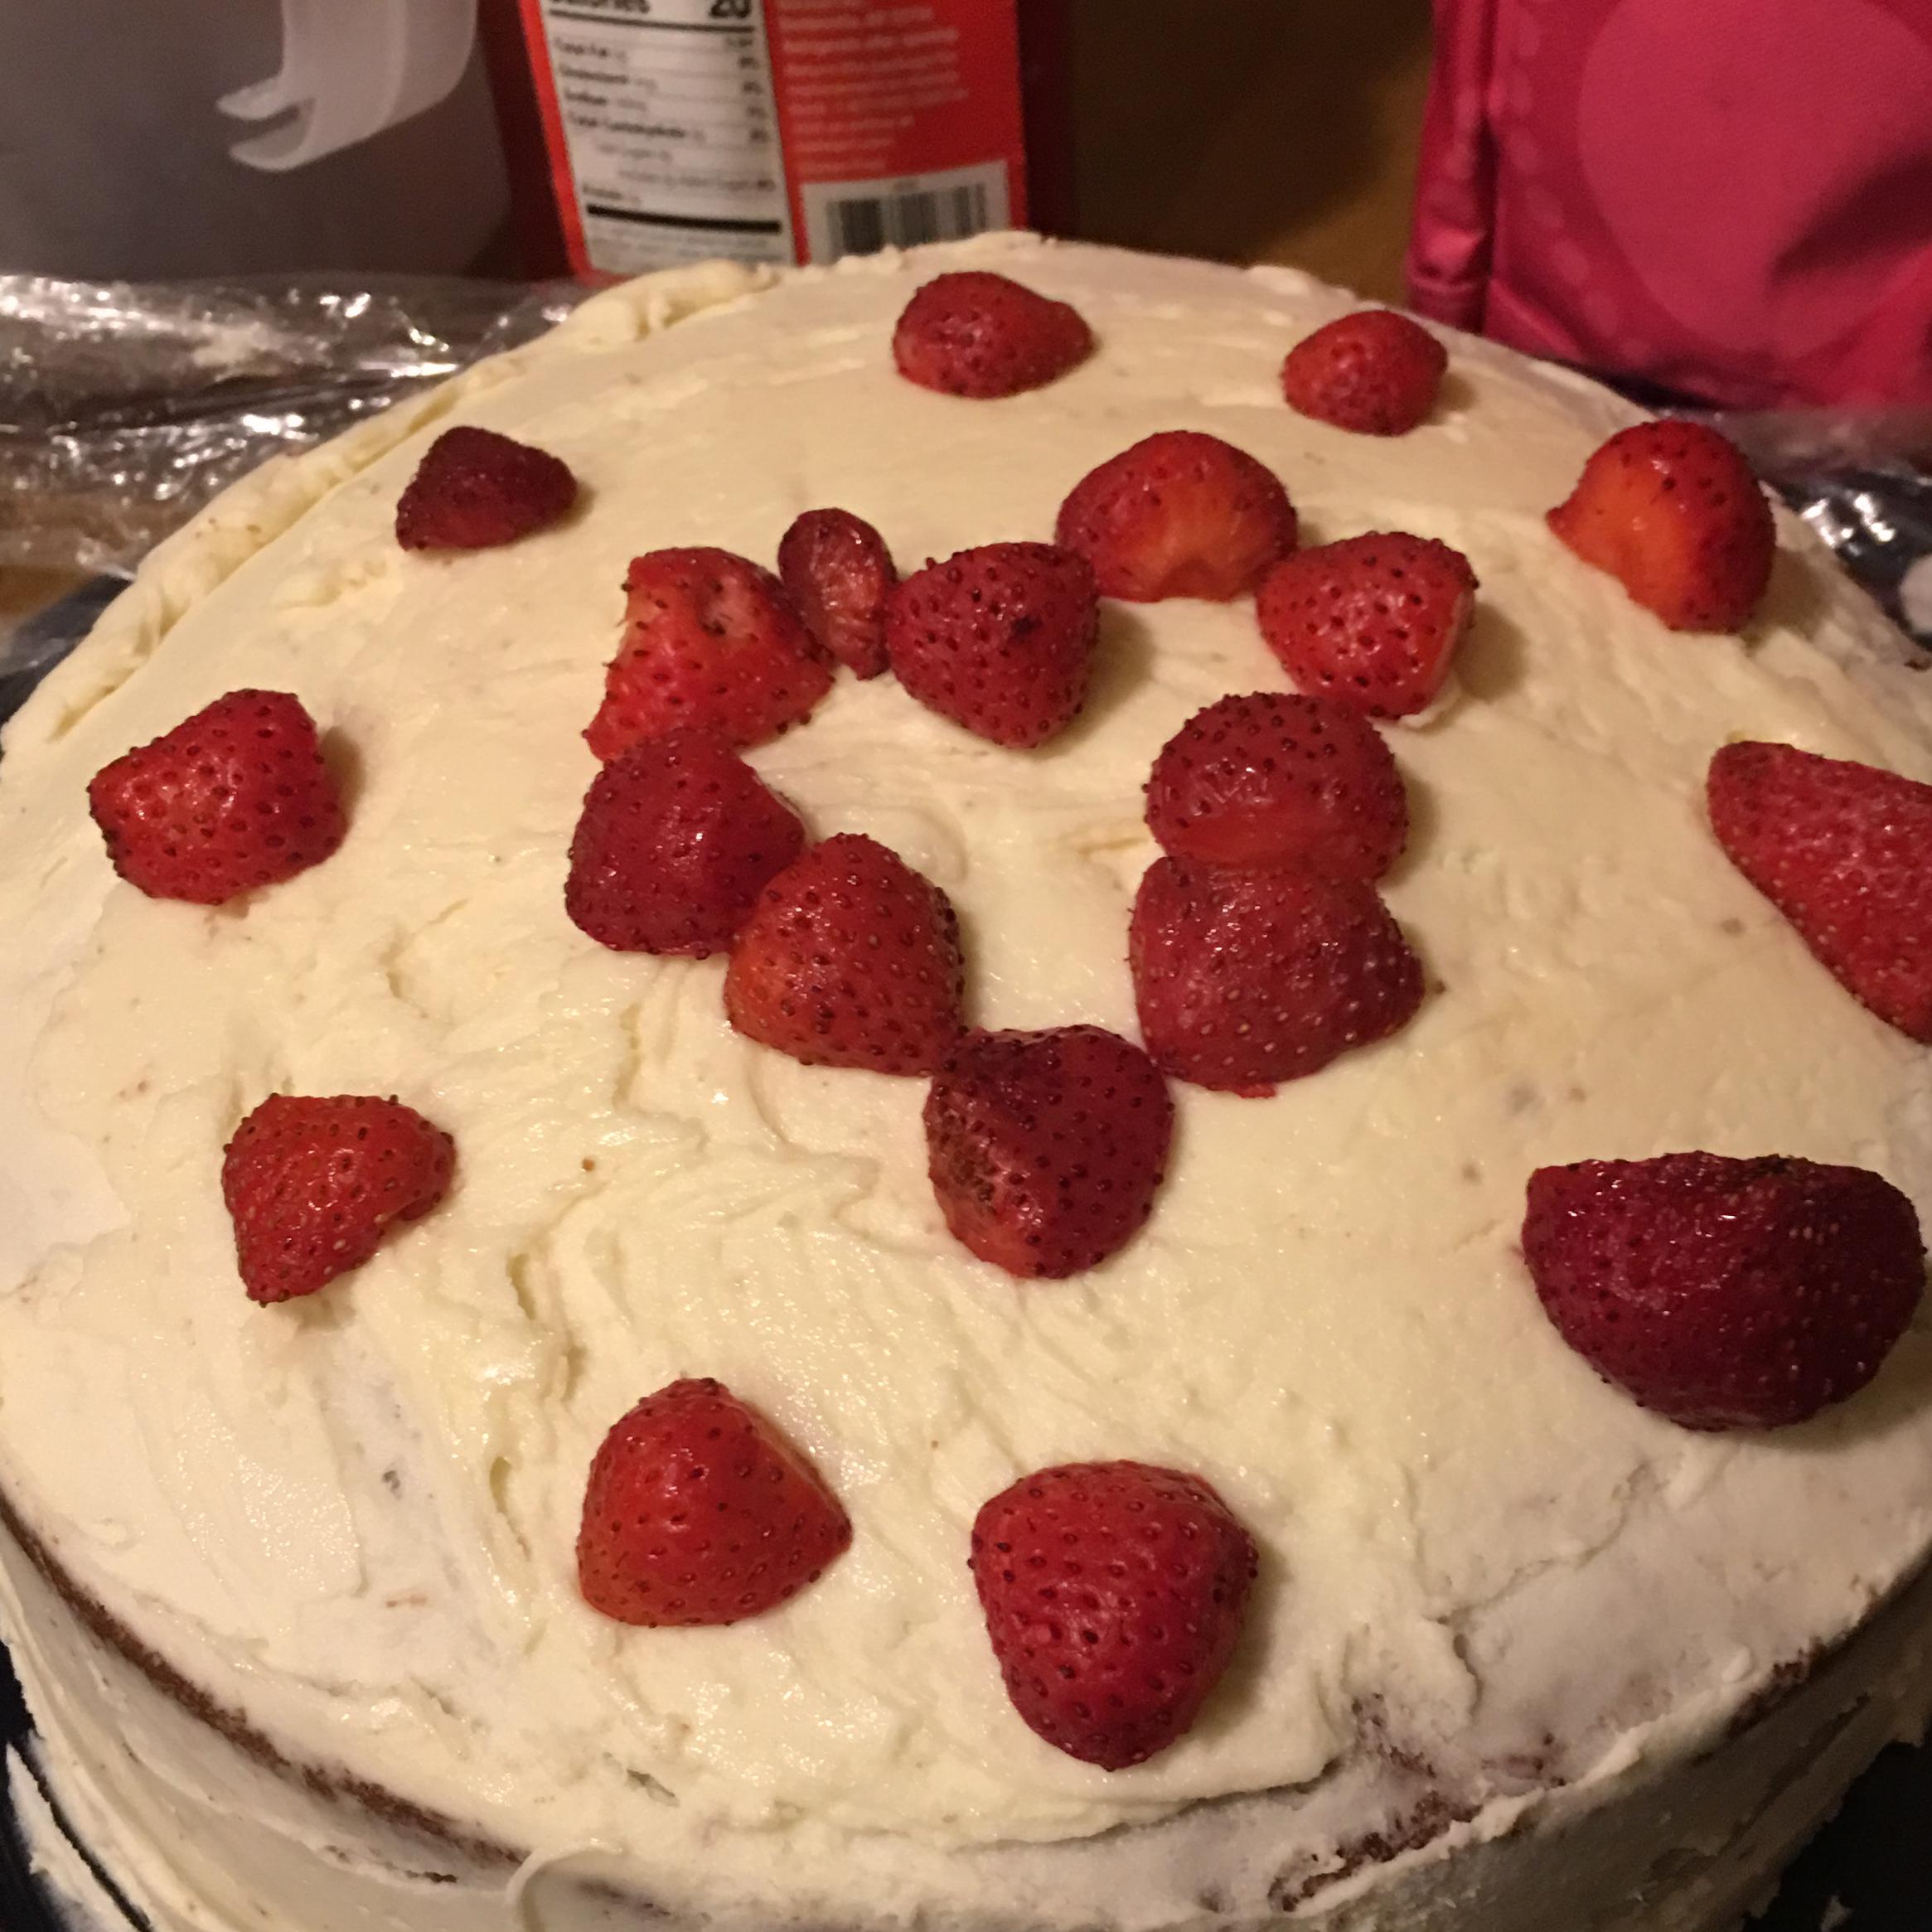 Red Velvet Cheesecake with Buttercream Frosting RachelS